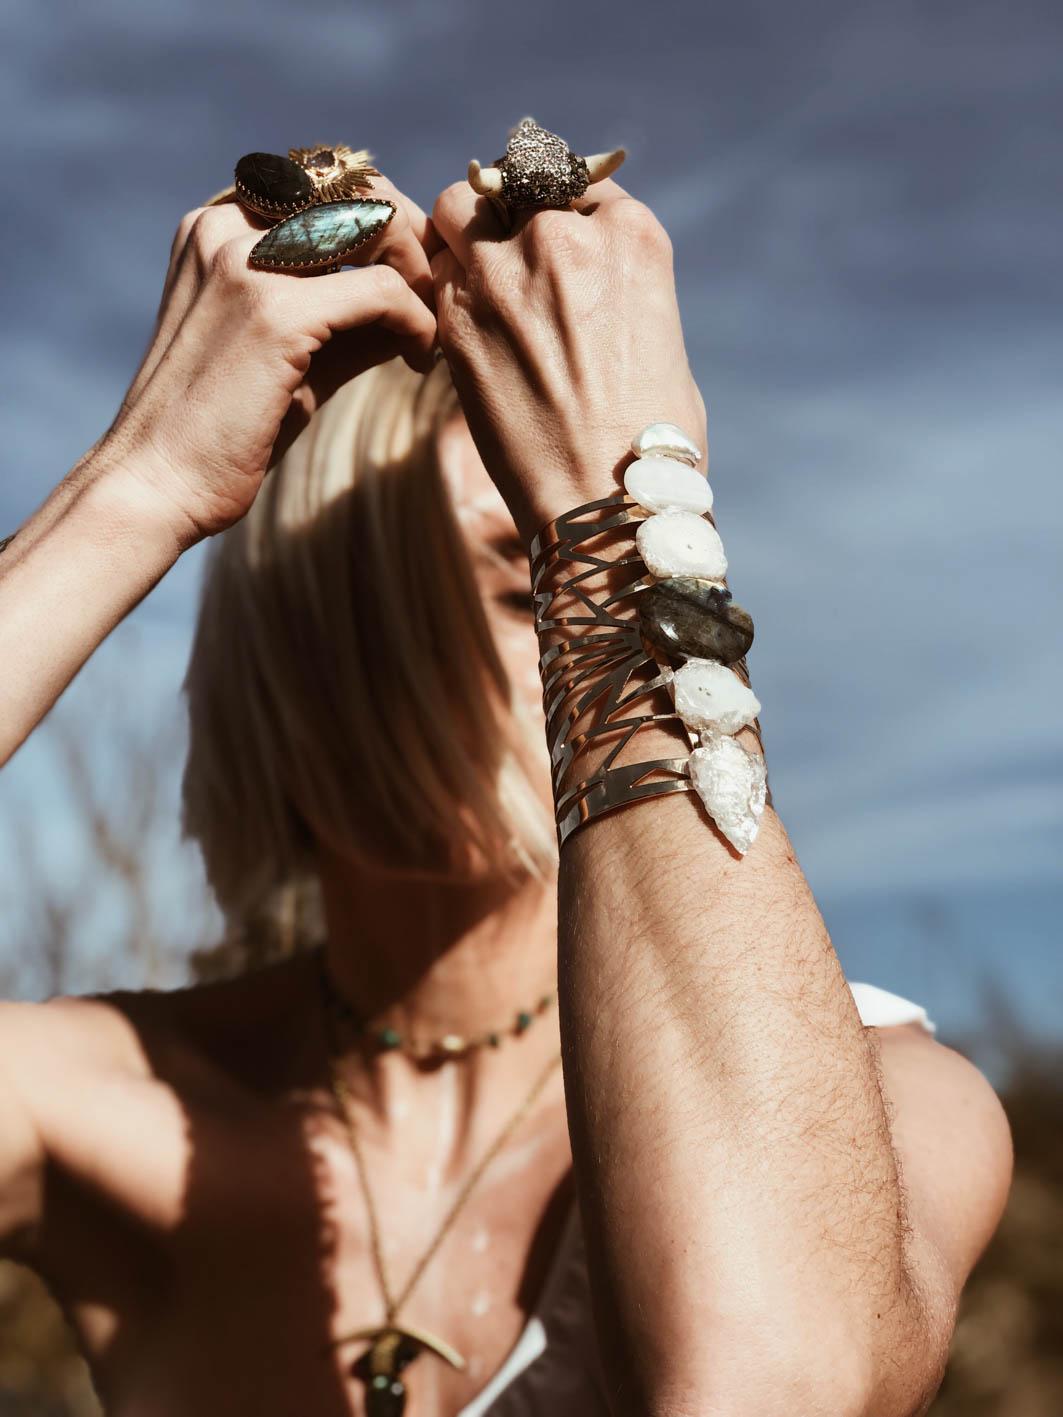 Carnet sauvage- blog mode et tendances - christina rose jewelry19.jpg